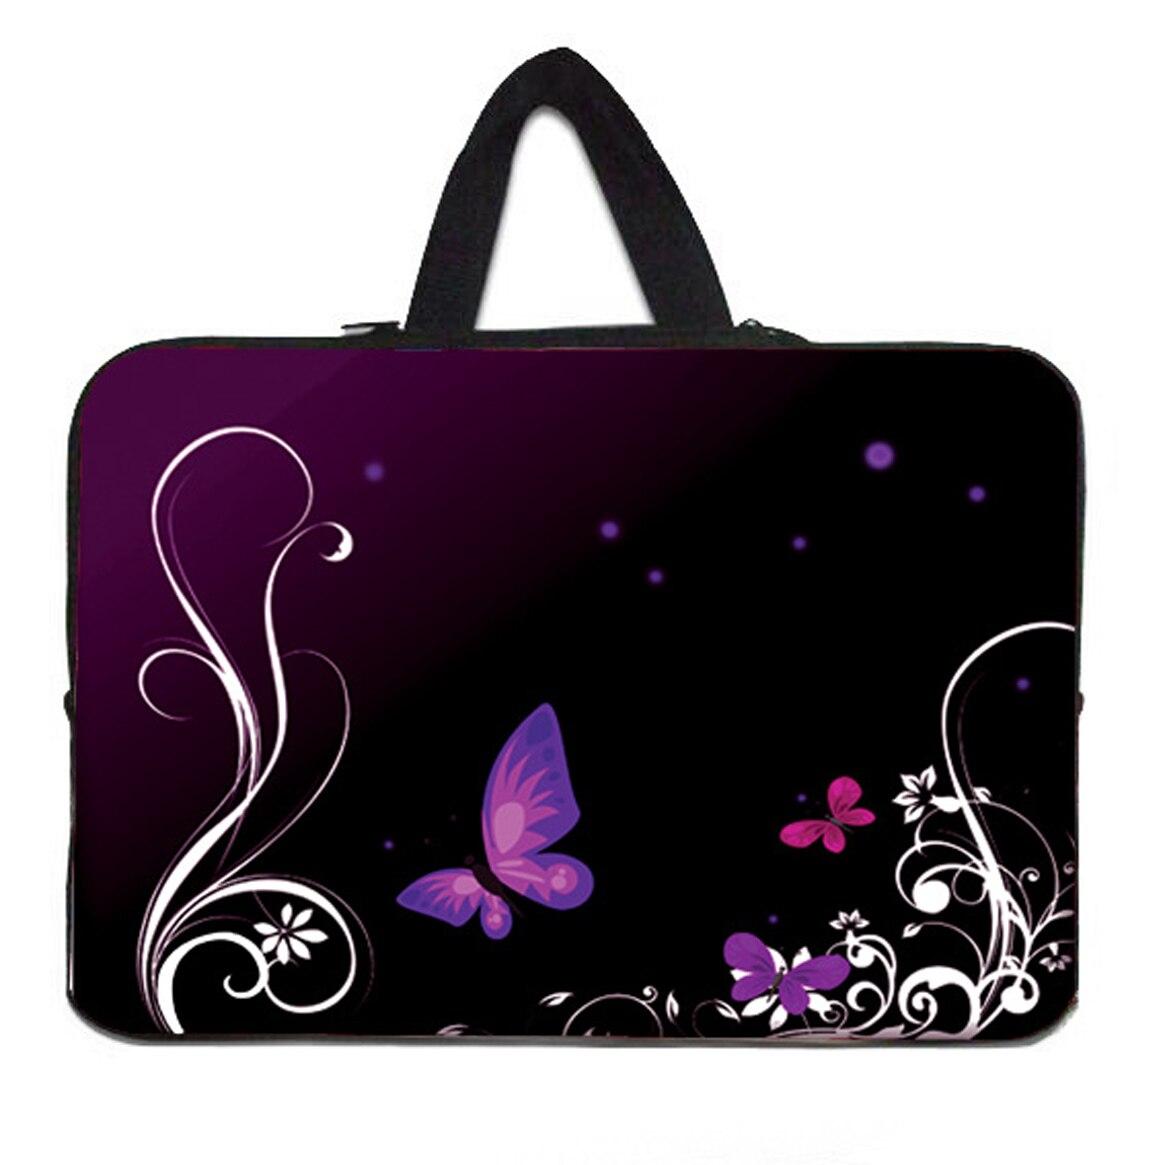 Laptop Case 17 10 15 14 13.3 12 13 Inch High Quality Ladies Fashion Handbags Sleeve Notebook Bag Bolsas For Sony Vaio Toshiba